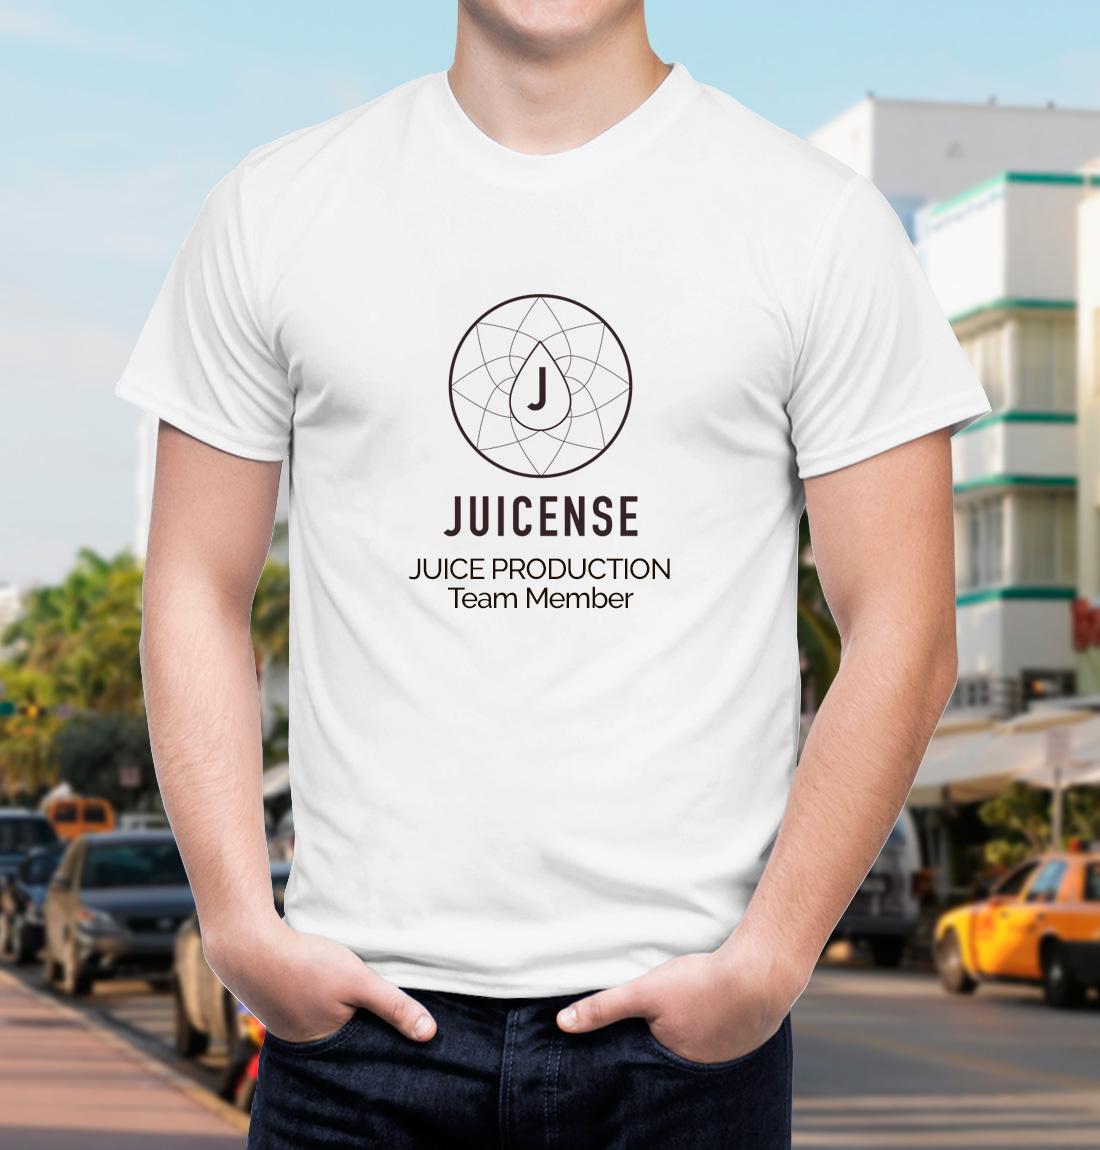 careers-juice-production